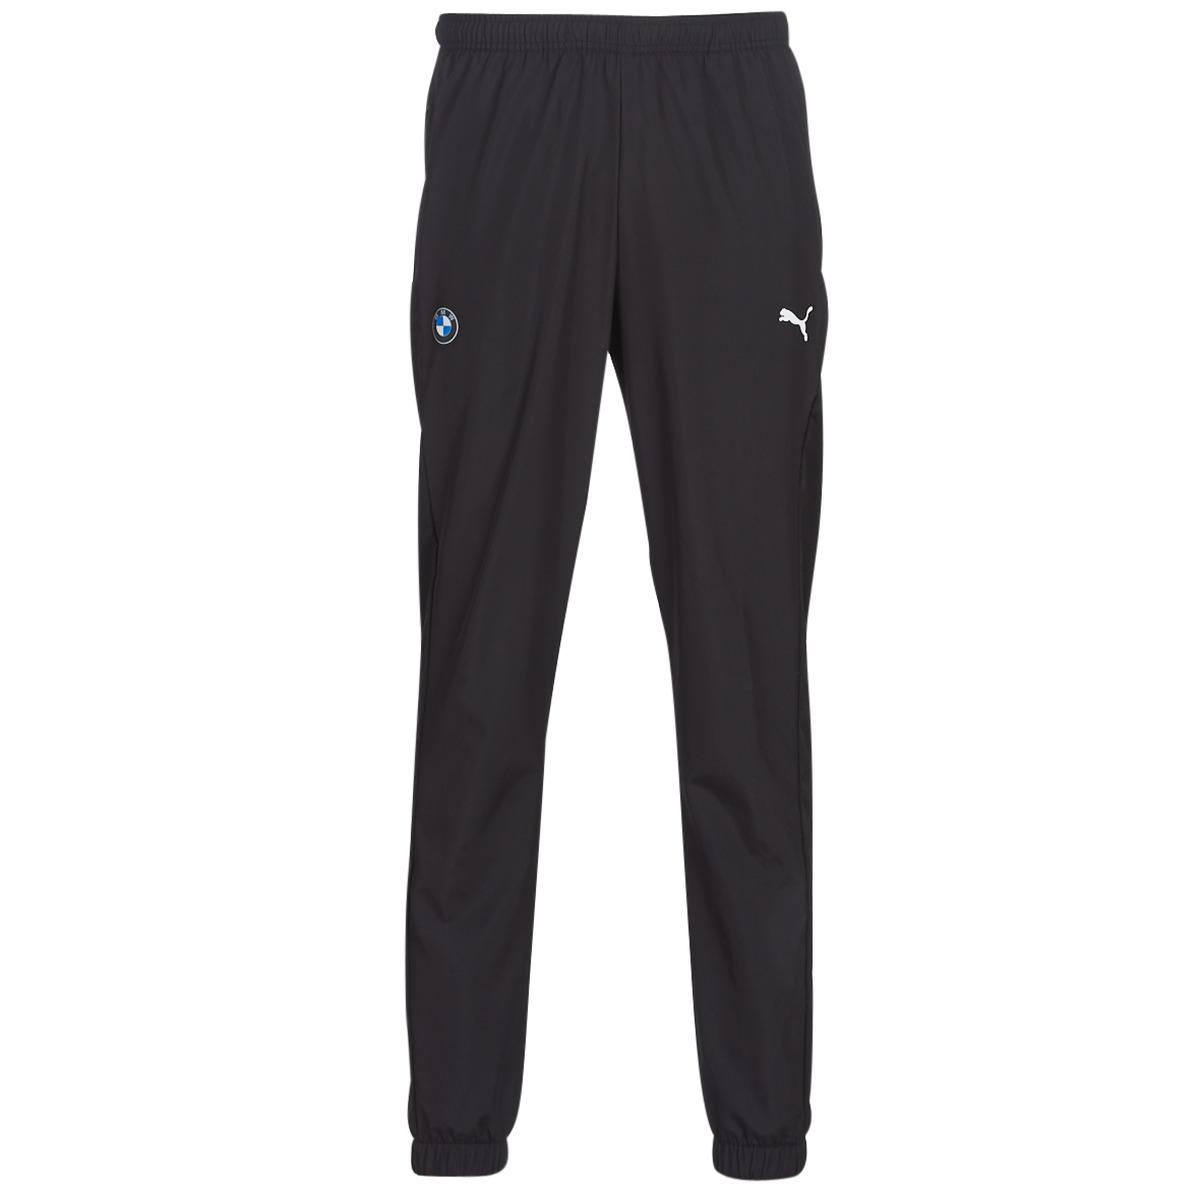 Joggingtøj / Træningstøj Puma  BMW MMS WOVEN PANTS